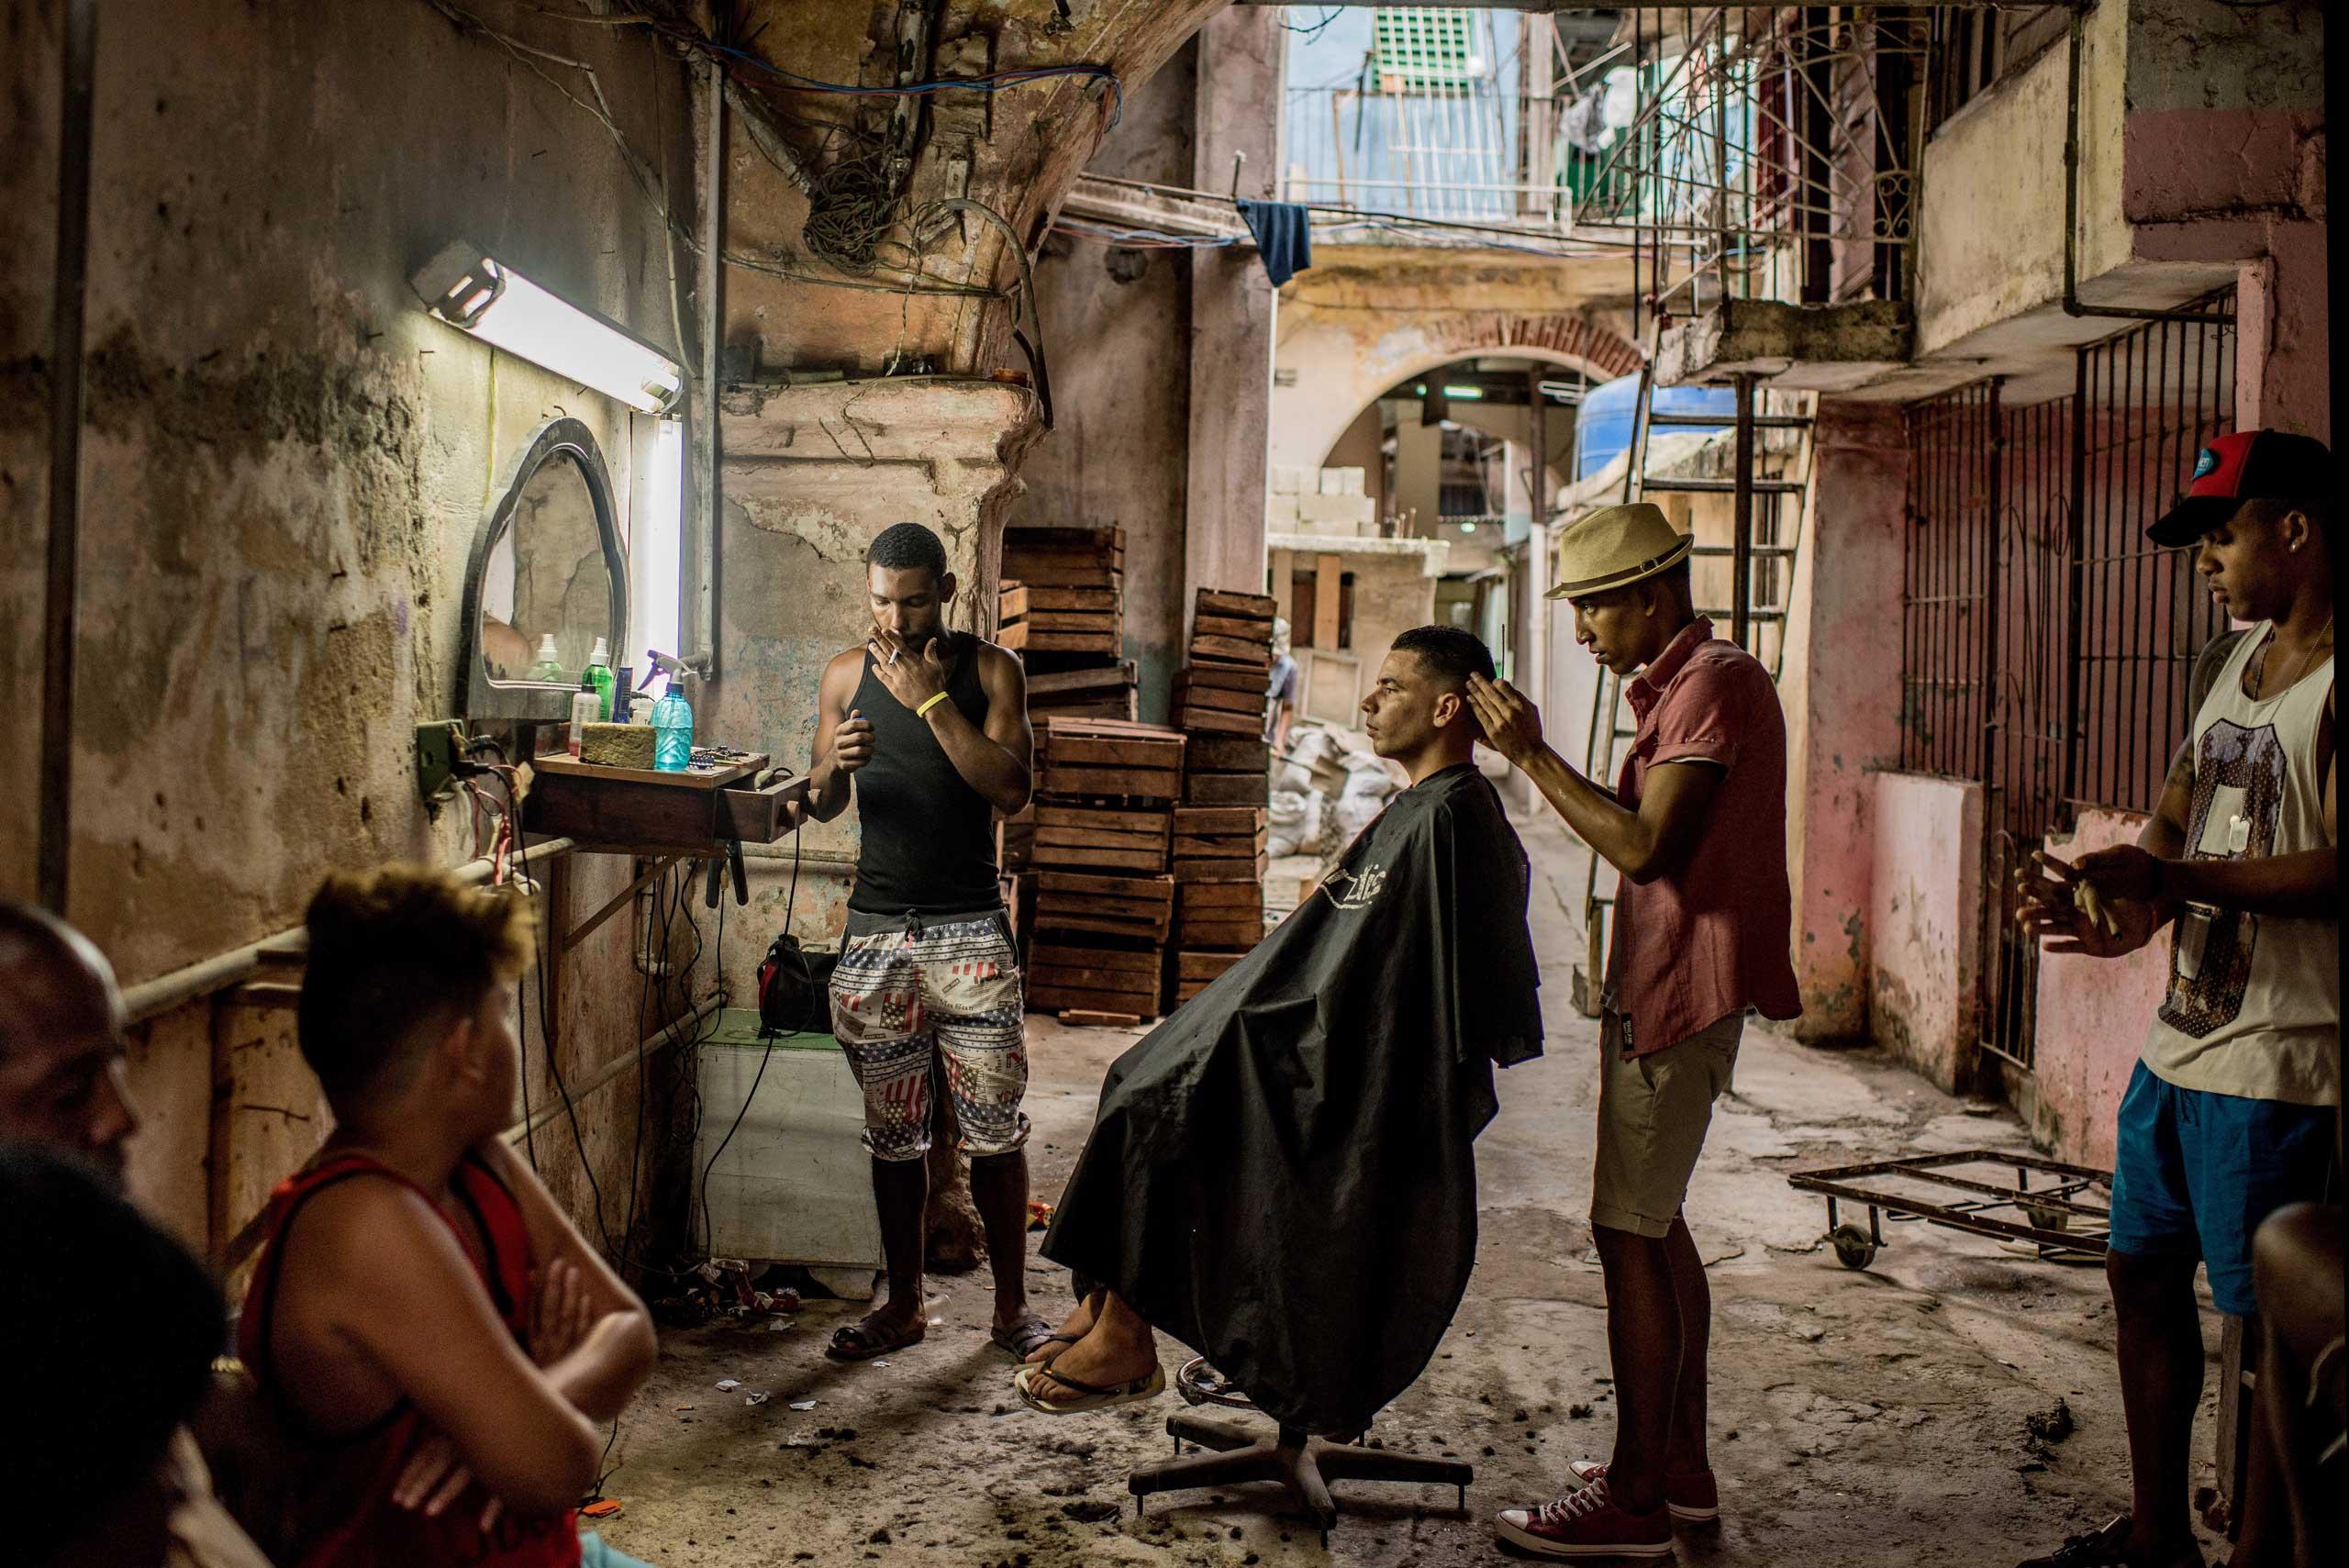 A weathered barbershop in Old Havana, Cuba on Jan. 25, 2016.